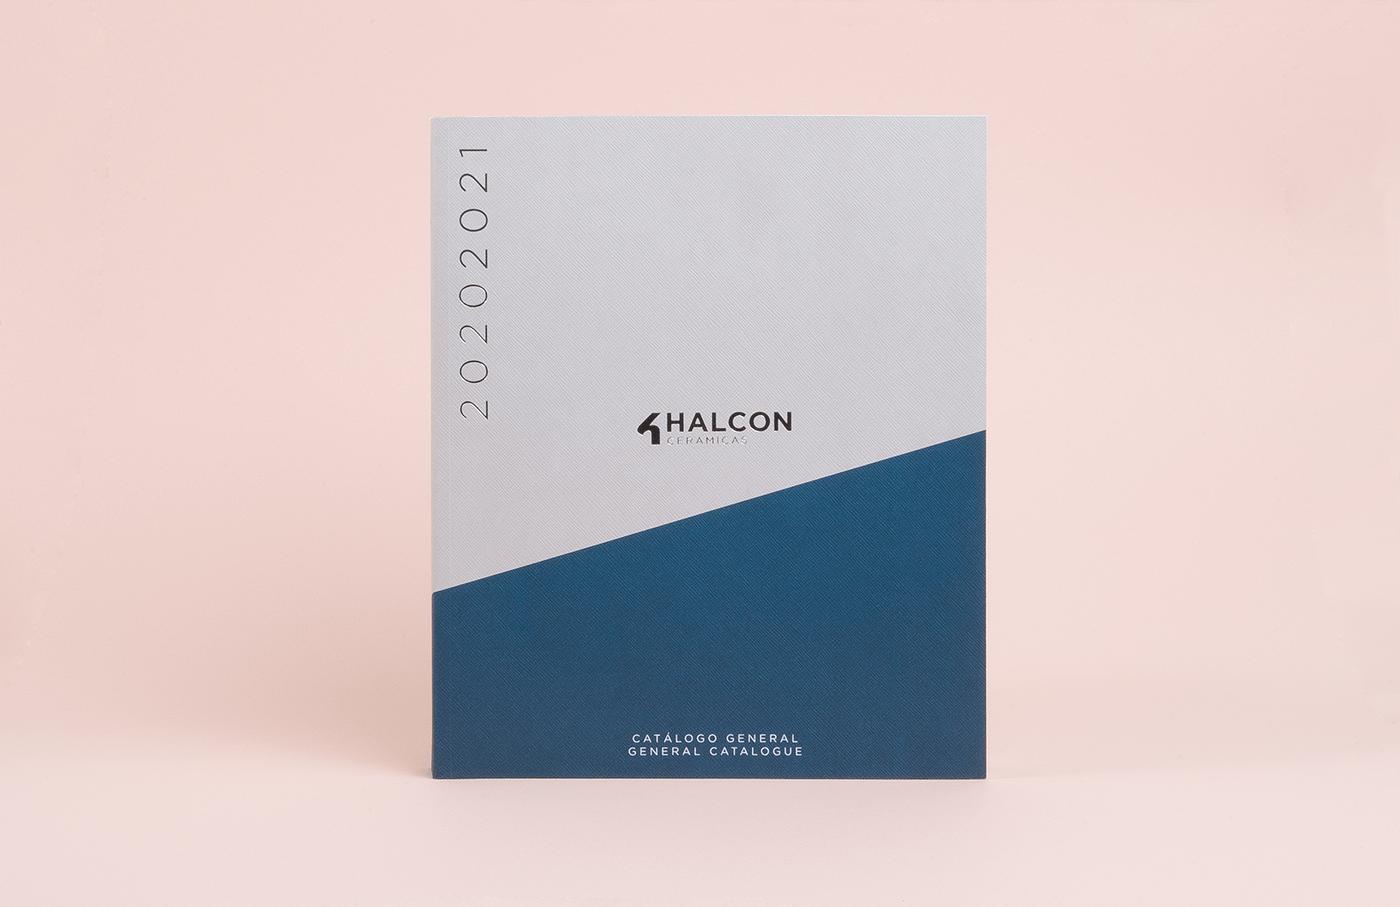 marenostrumgraficas- Grupo Halcon - catálogo general 2020 1